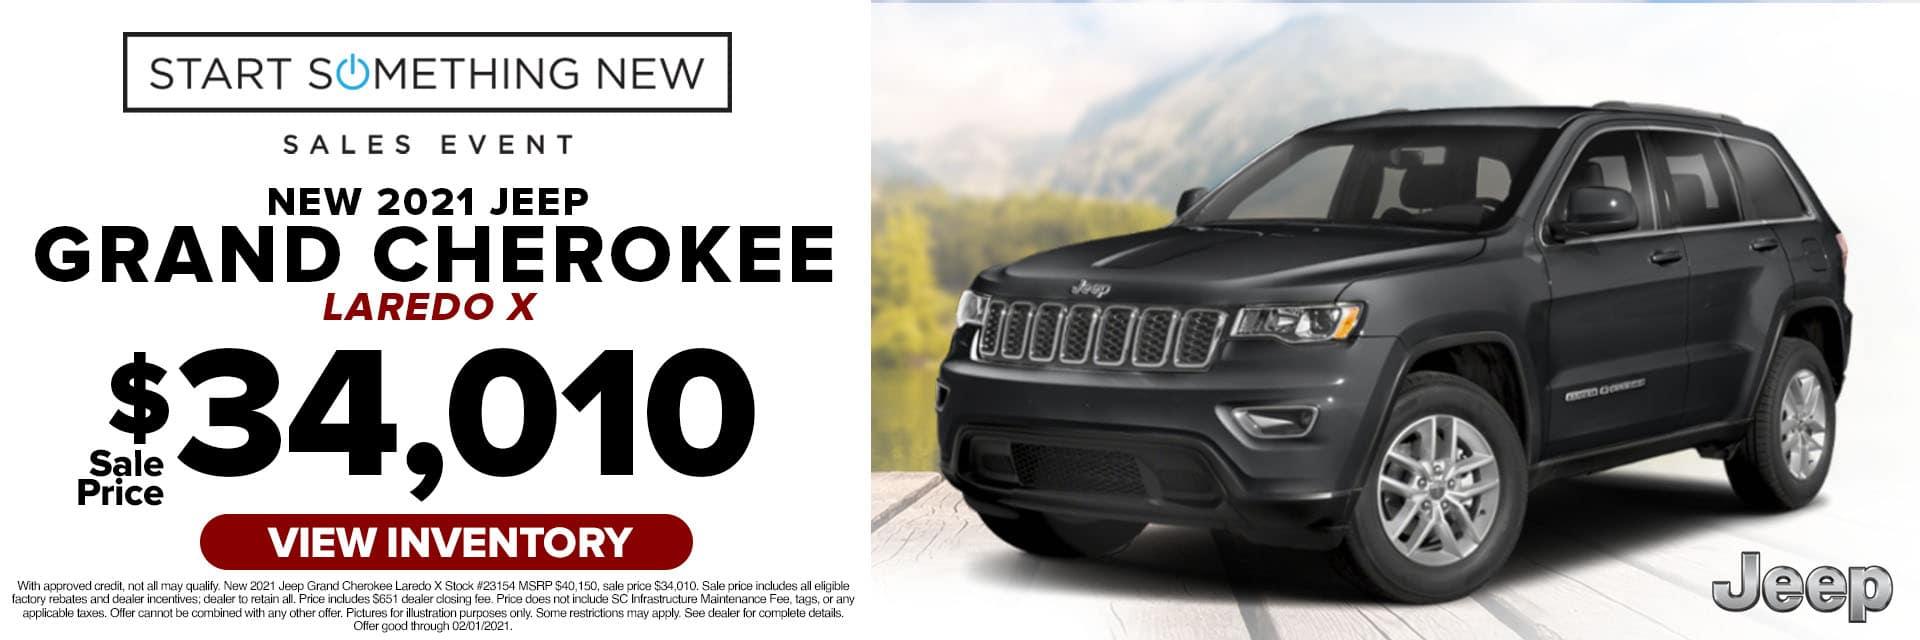 SLCJ-January 2021-2020 Jeep Grand Cdherokee